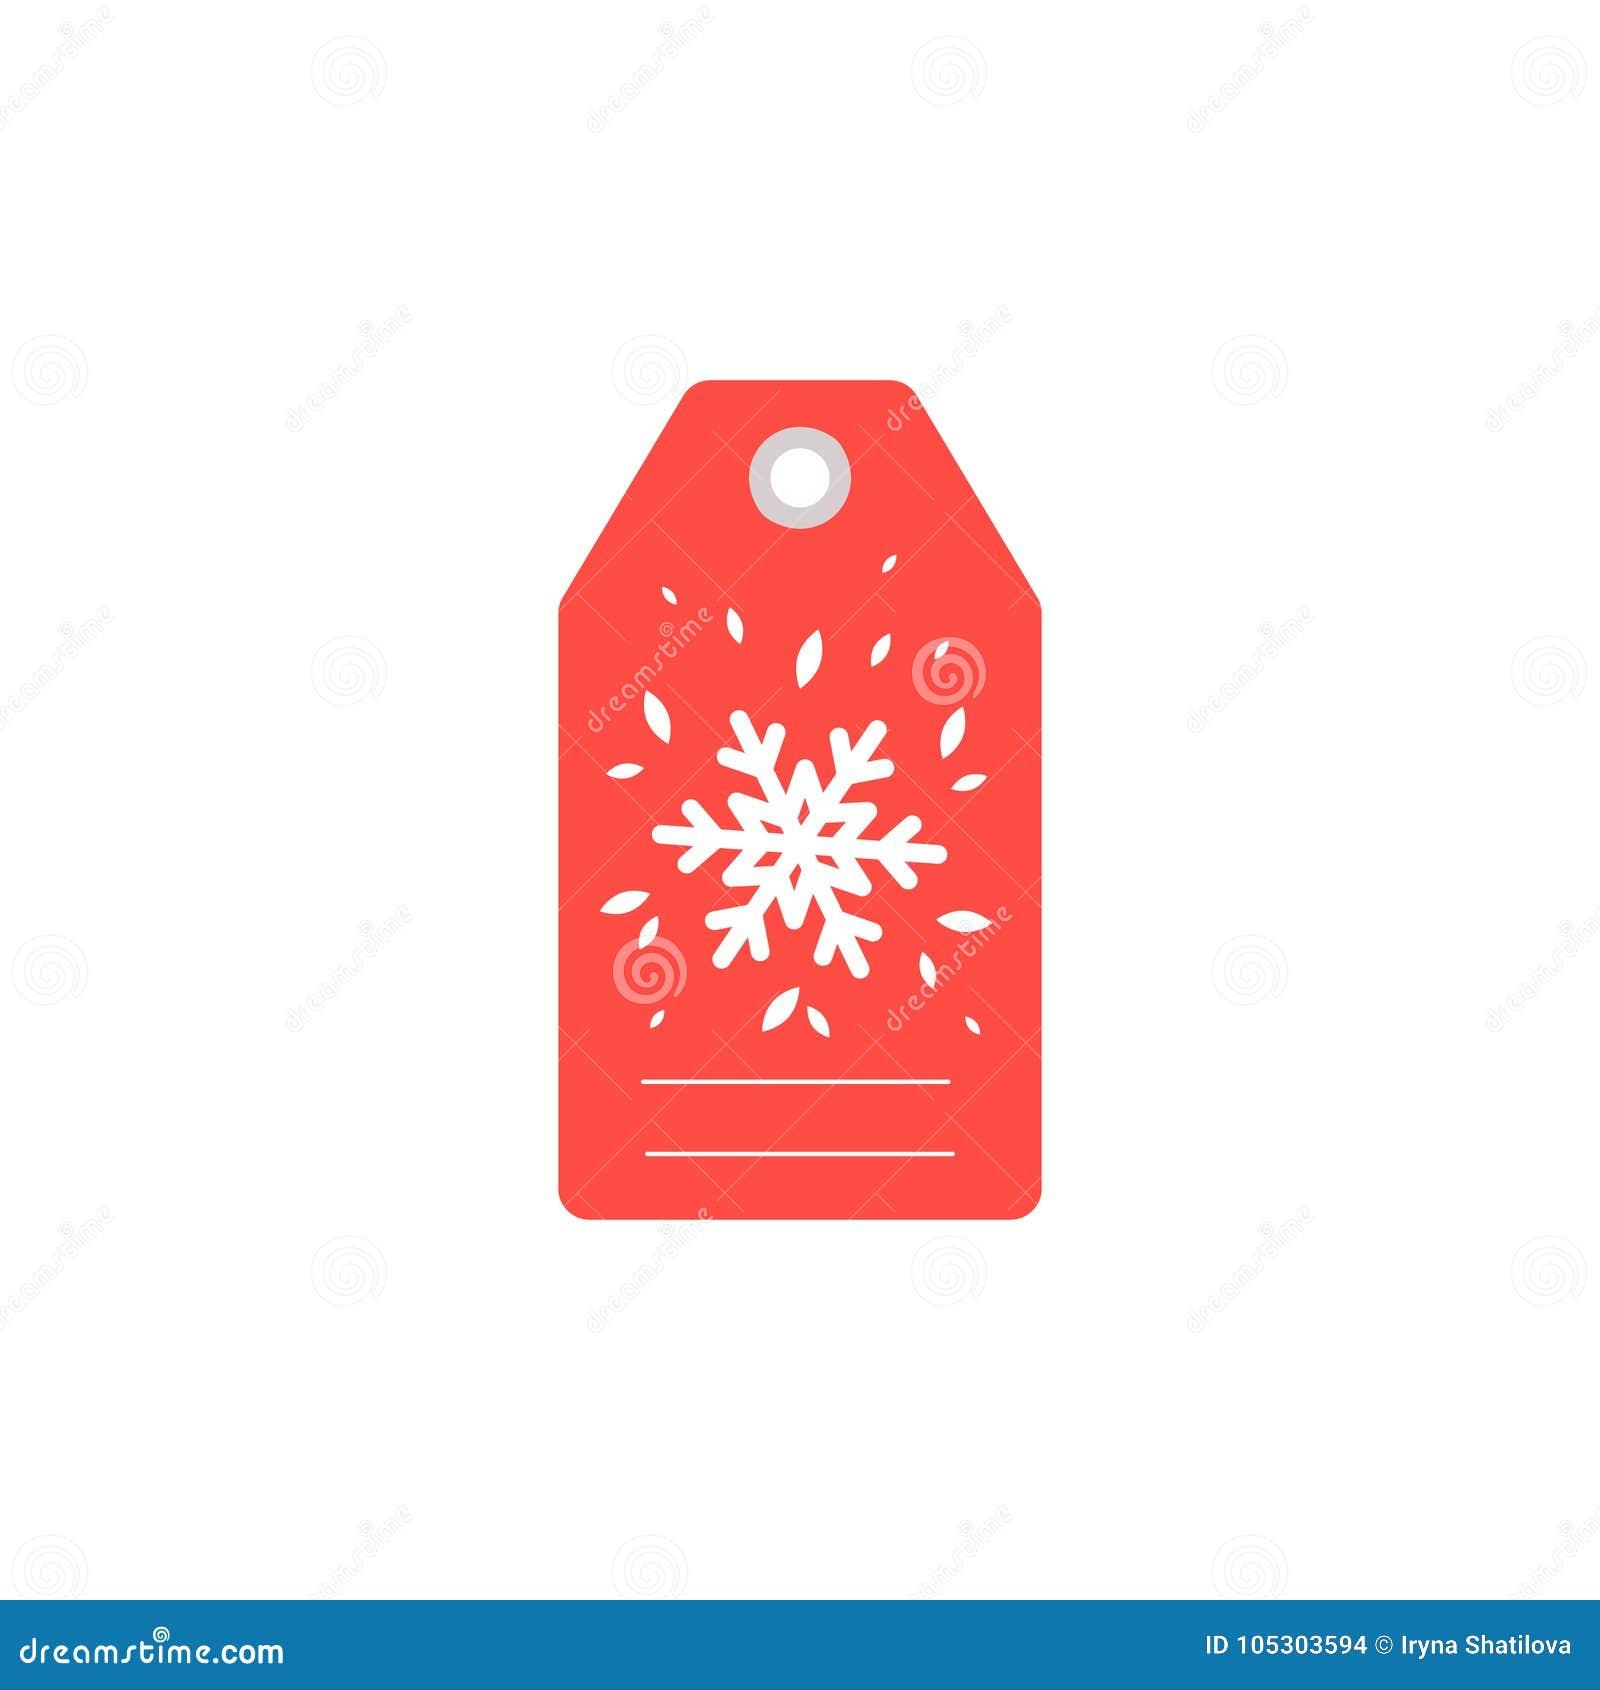 Christmas Gift Tag.Gift Tag For The Holiday Christmas Gift Tag With Snow